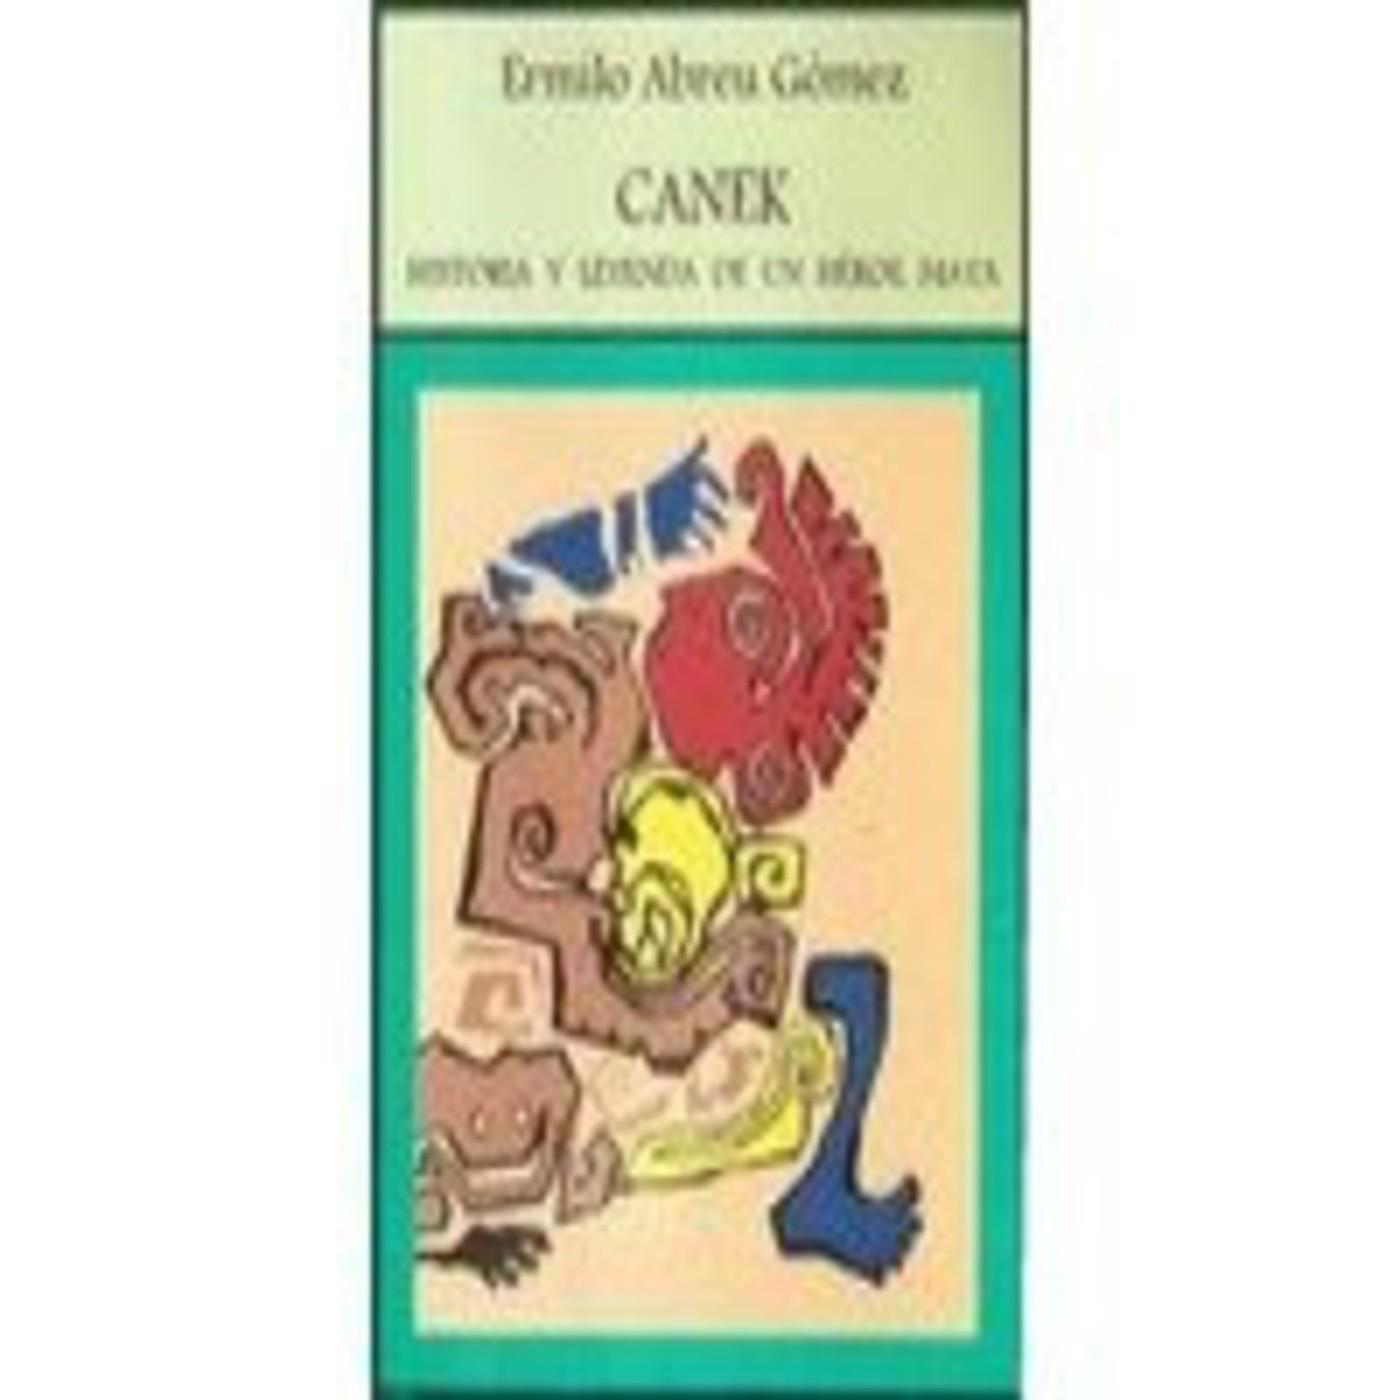 Canek-Ermilo Abreu Gomez (Radio Educacion)